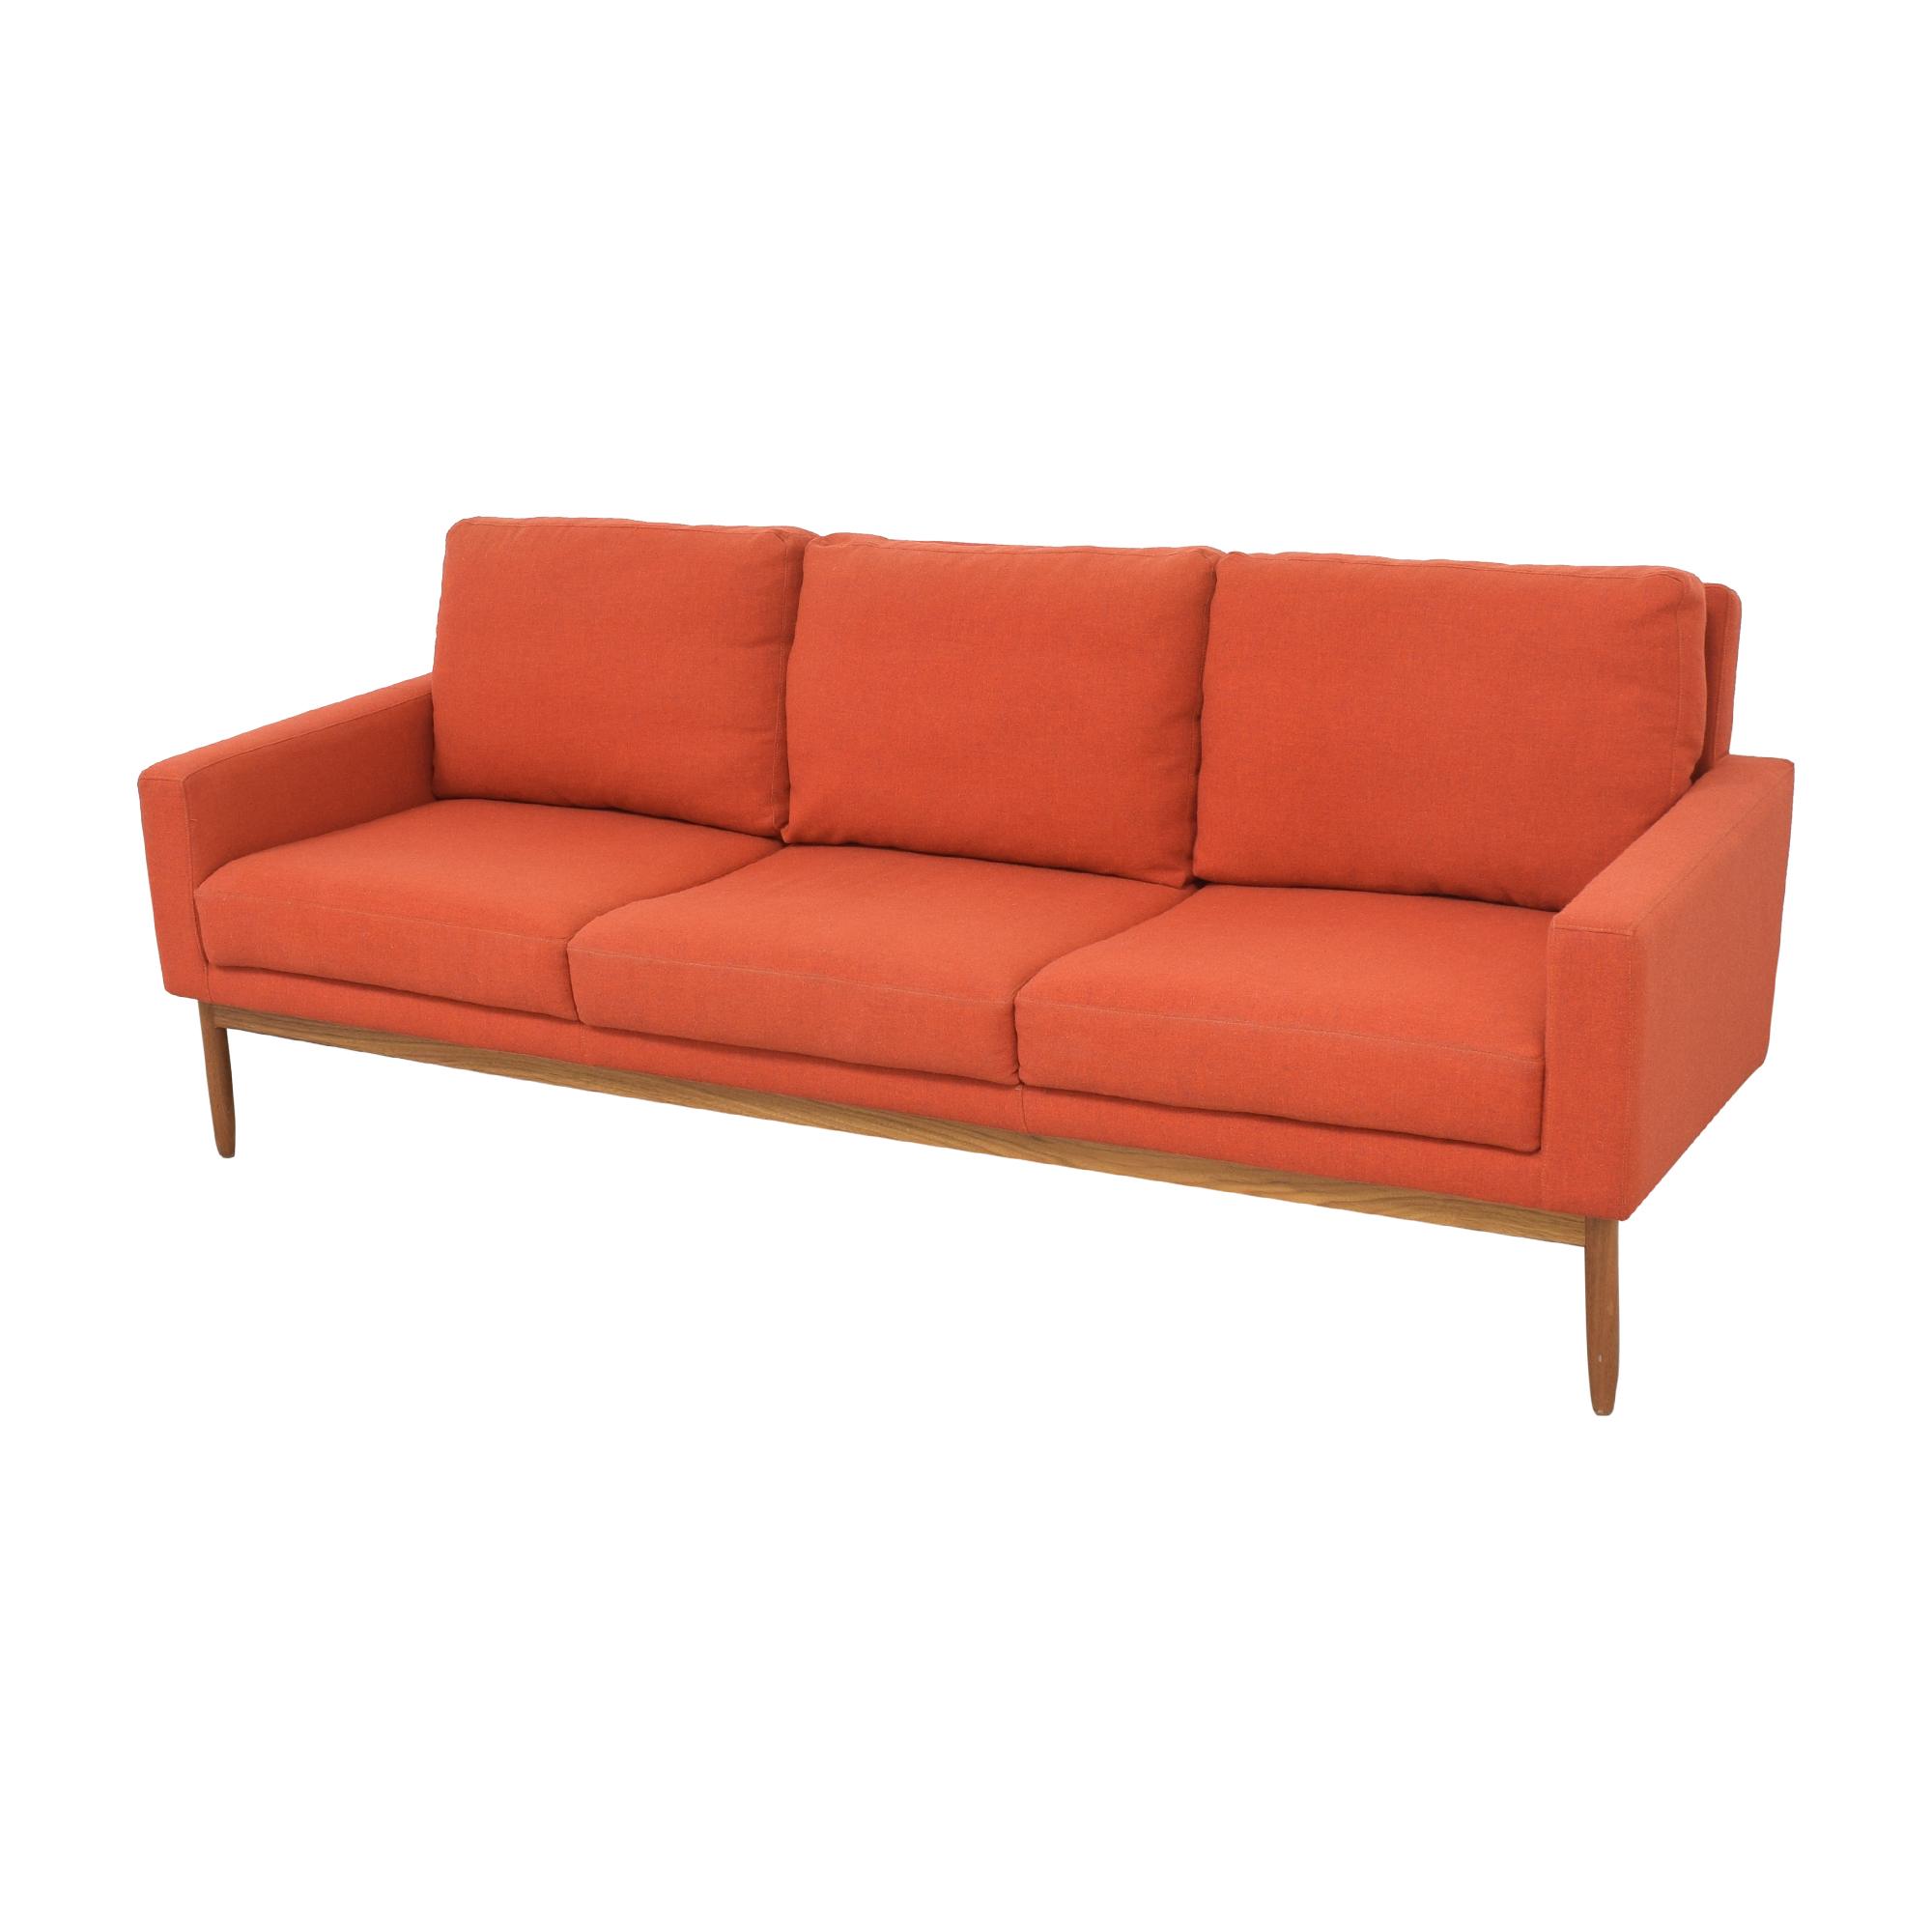 Design Within Reach Design Within Reach Raleigh Three Seat Sofa ma